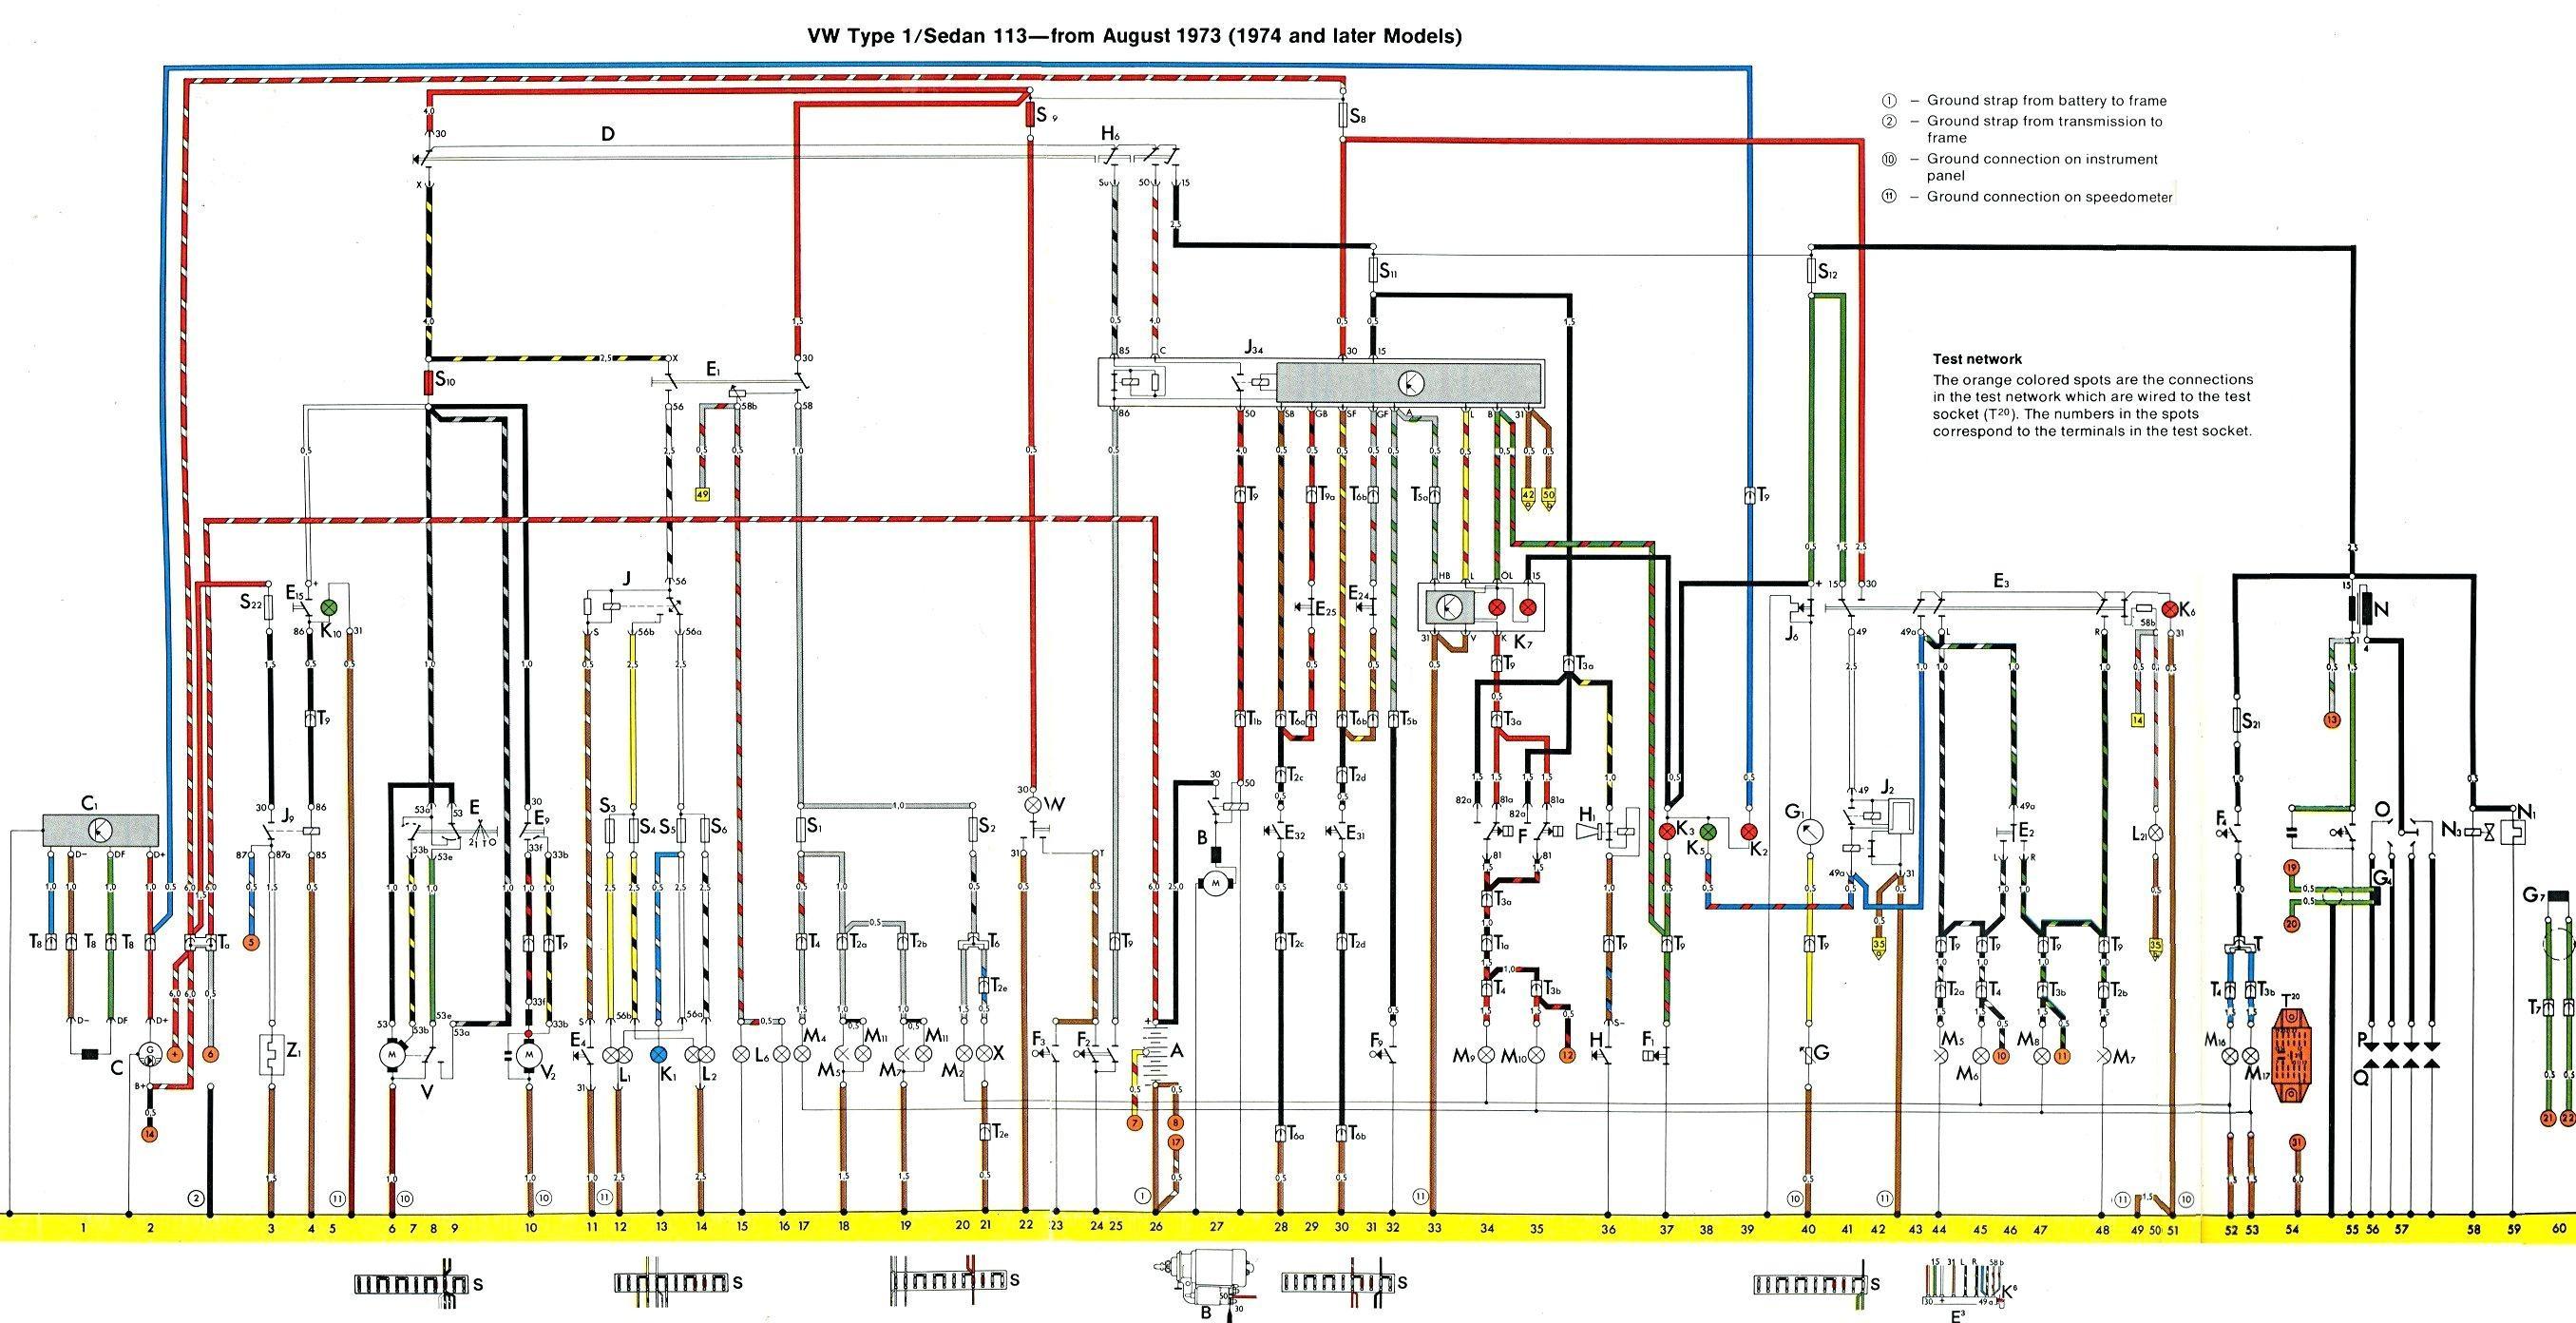 2000 Vw Beetle 1 8 Turbo Engine Diagram Wiring - Wiring ... Vw Turbo Engine Diagram on all vw 1998 engine diagram, 06 vw passat 2.0t engine diagram, vw 2.5 turbo, vw 2.0t fsi engine diagram, hyundai 2.0 engine diagram, vw 2.5 liter engine, vw 2.0 turbo engine review, rx7 twin turbo engine diagram, vw gti engine diagram, vw 1.8 engine diagram, vw air cooled engine diagram, vw v6 engine diagram, 2003 vw passat turbo diagram, vw audi engine diagram, 03 jetta 2.0 engine diagram, vw jetta engine diagram, vw type 3 engine diagram, vw 1600 engine diagram, vw engine breakdown, 2000 jetta 2.0 engine diagram,